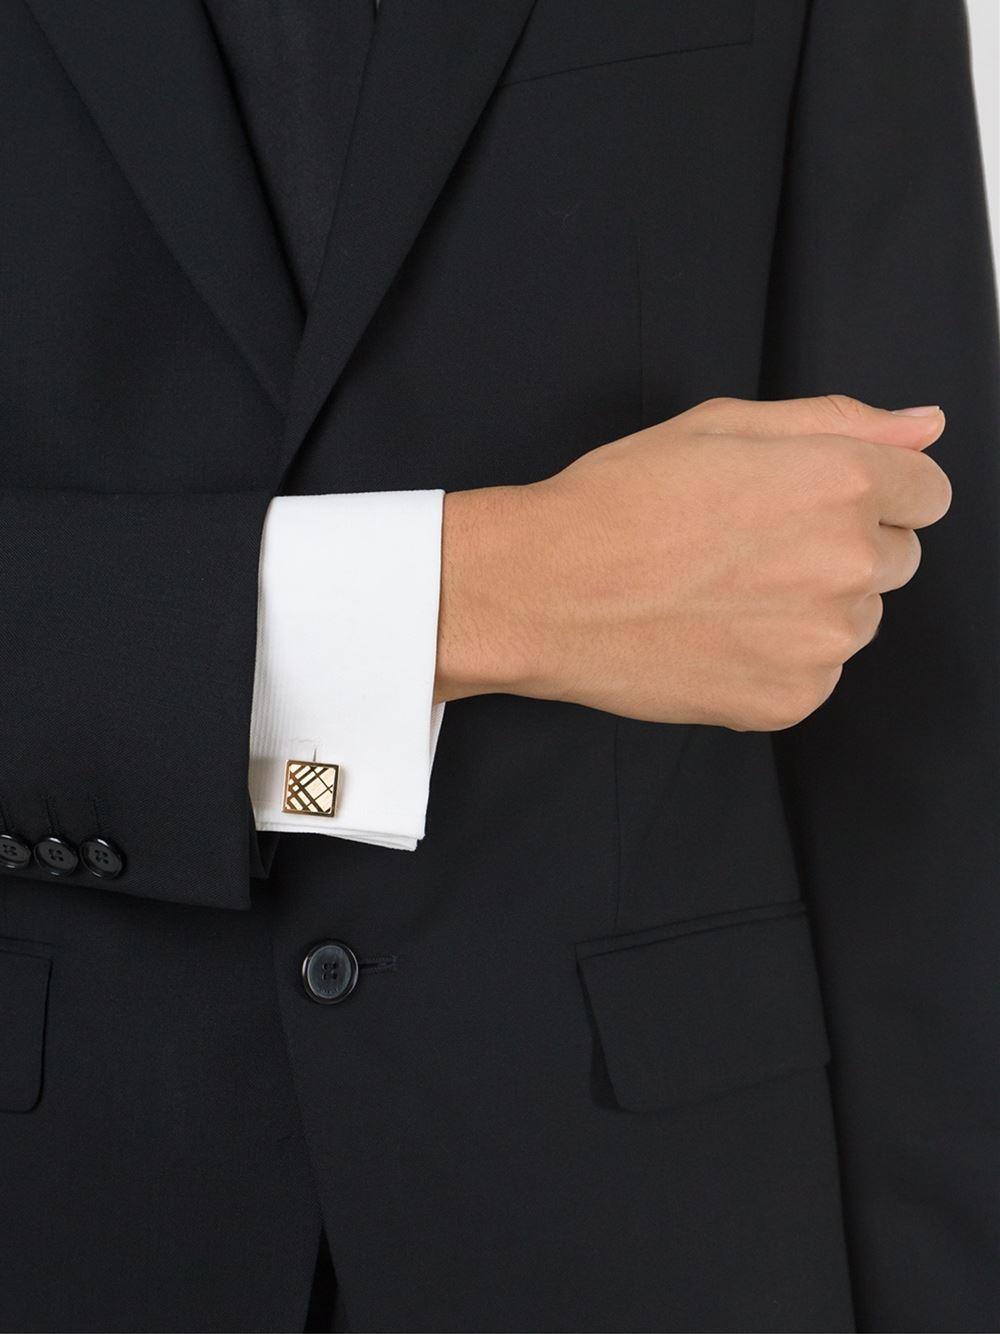 Burberry Check-engraved Square Cufflinks, Grey